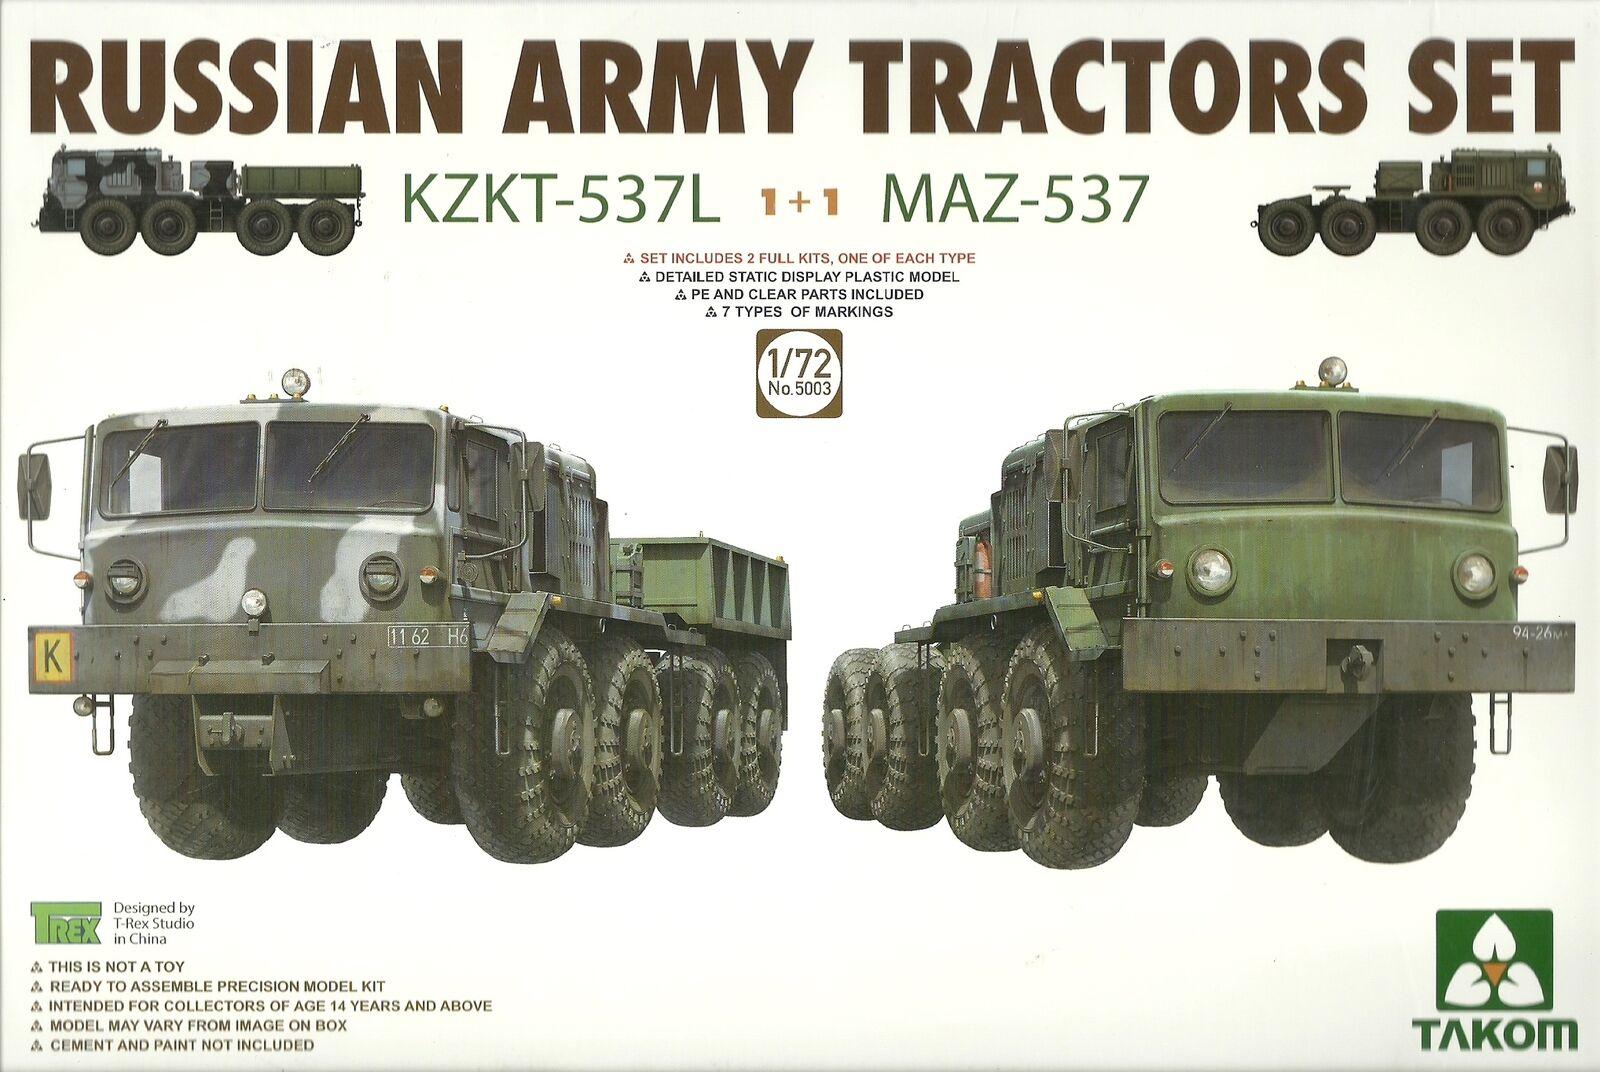 Takom 1 72 KZKT-537L & MAZ-537  Russian Army Tractor Set